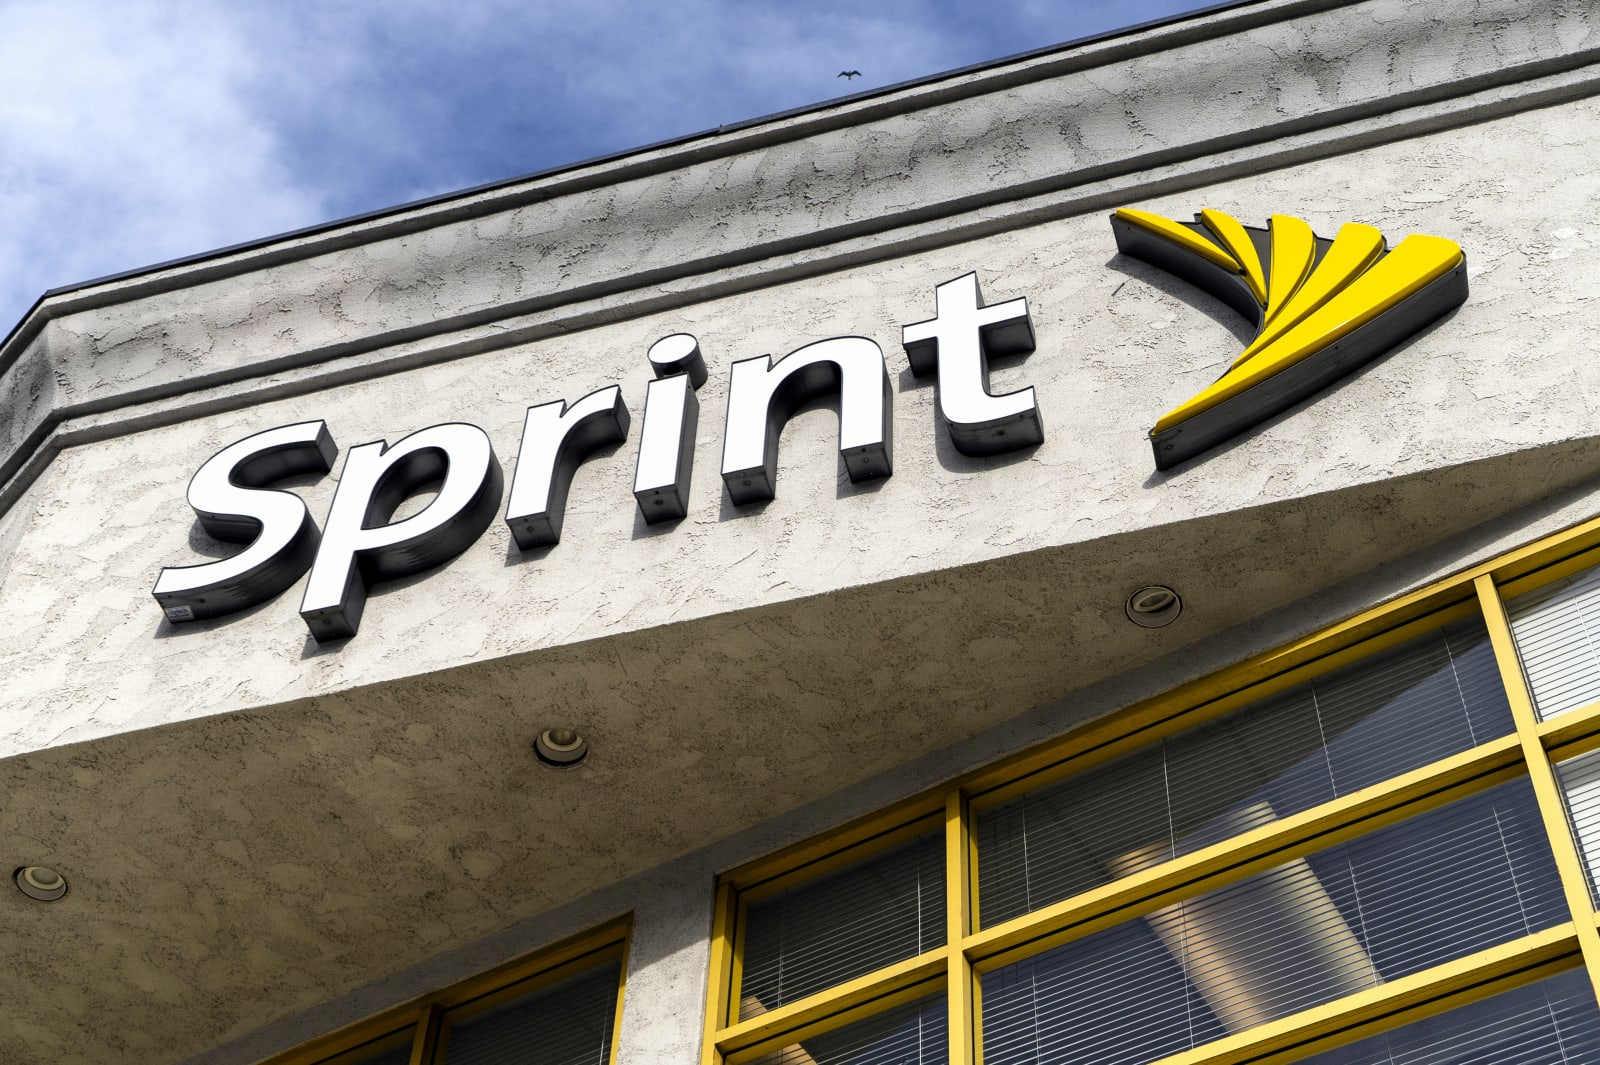 Hackers broke into Sprint accounts through Samsung's website